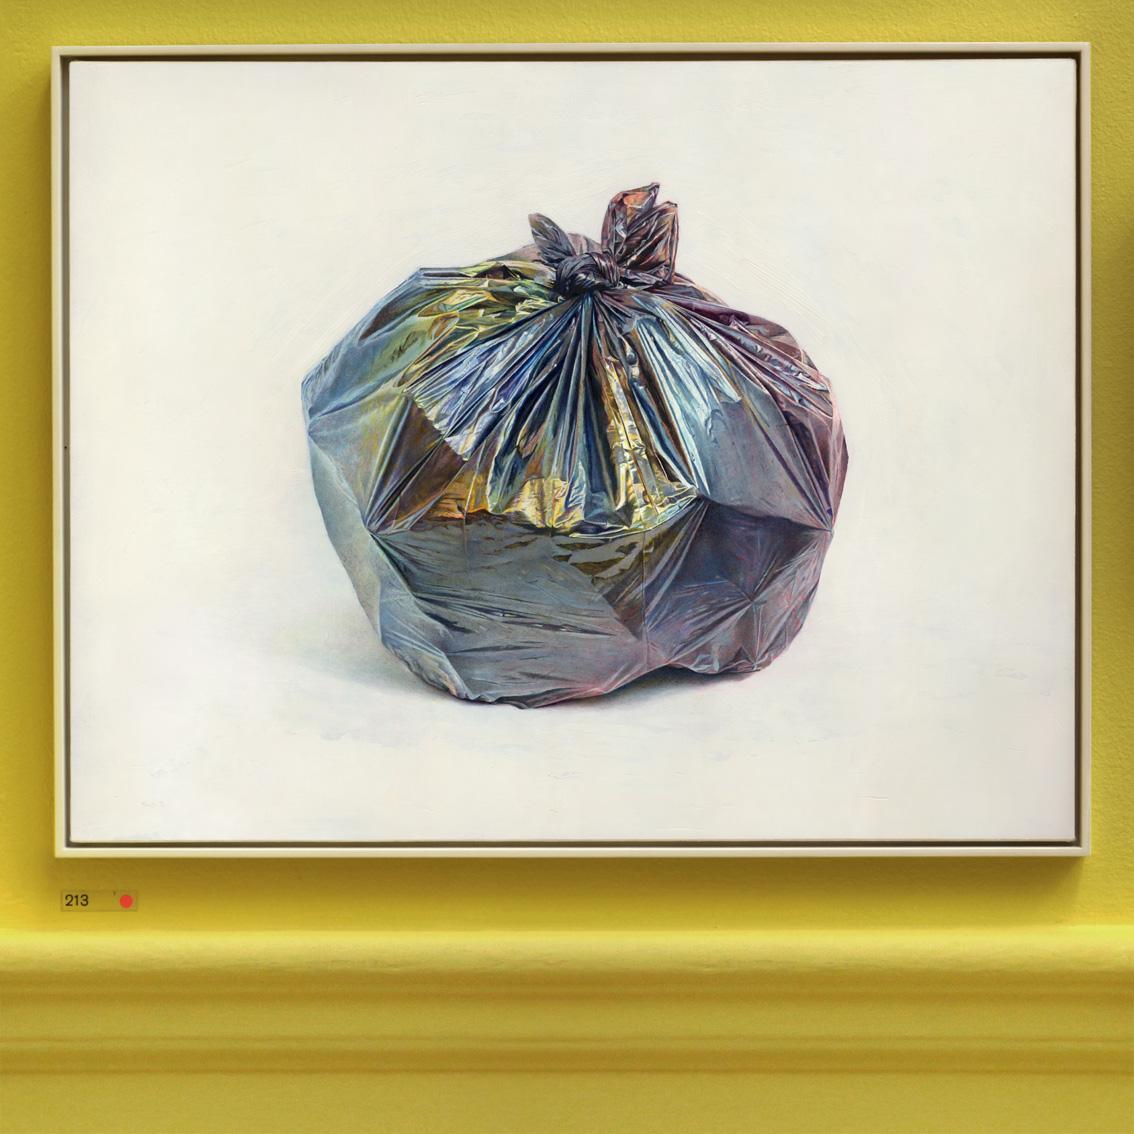 David Agenjo 'Bin-Bag' (2017) Oil on linen, 71x91cm